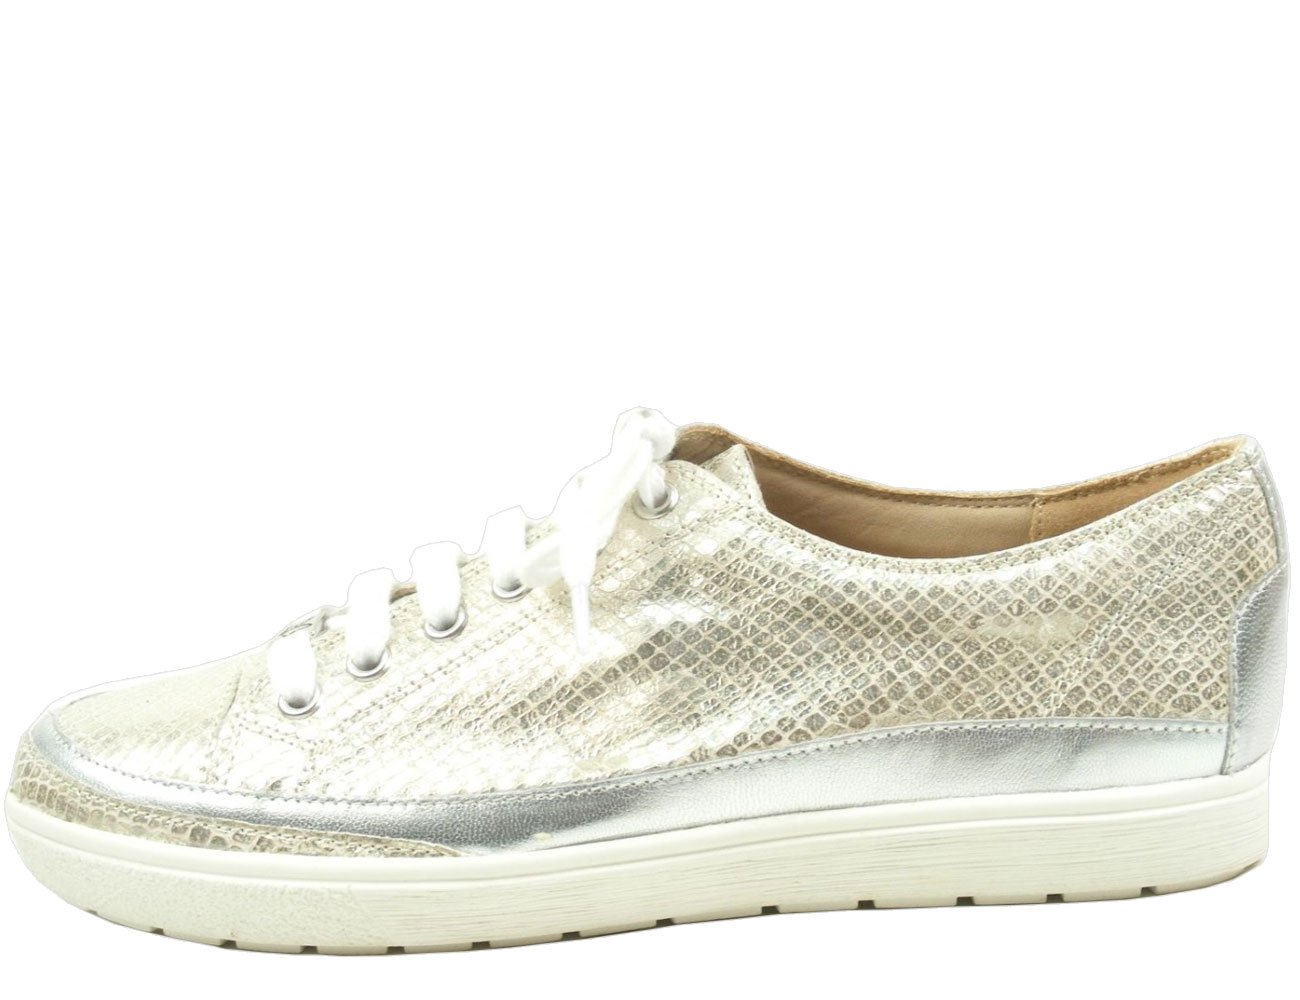 Caprice 23654, Zapatos de Cordones Derby para Mujer 37.5 EU|Light Gold Reptile Print